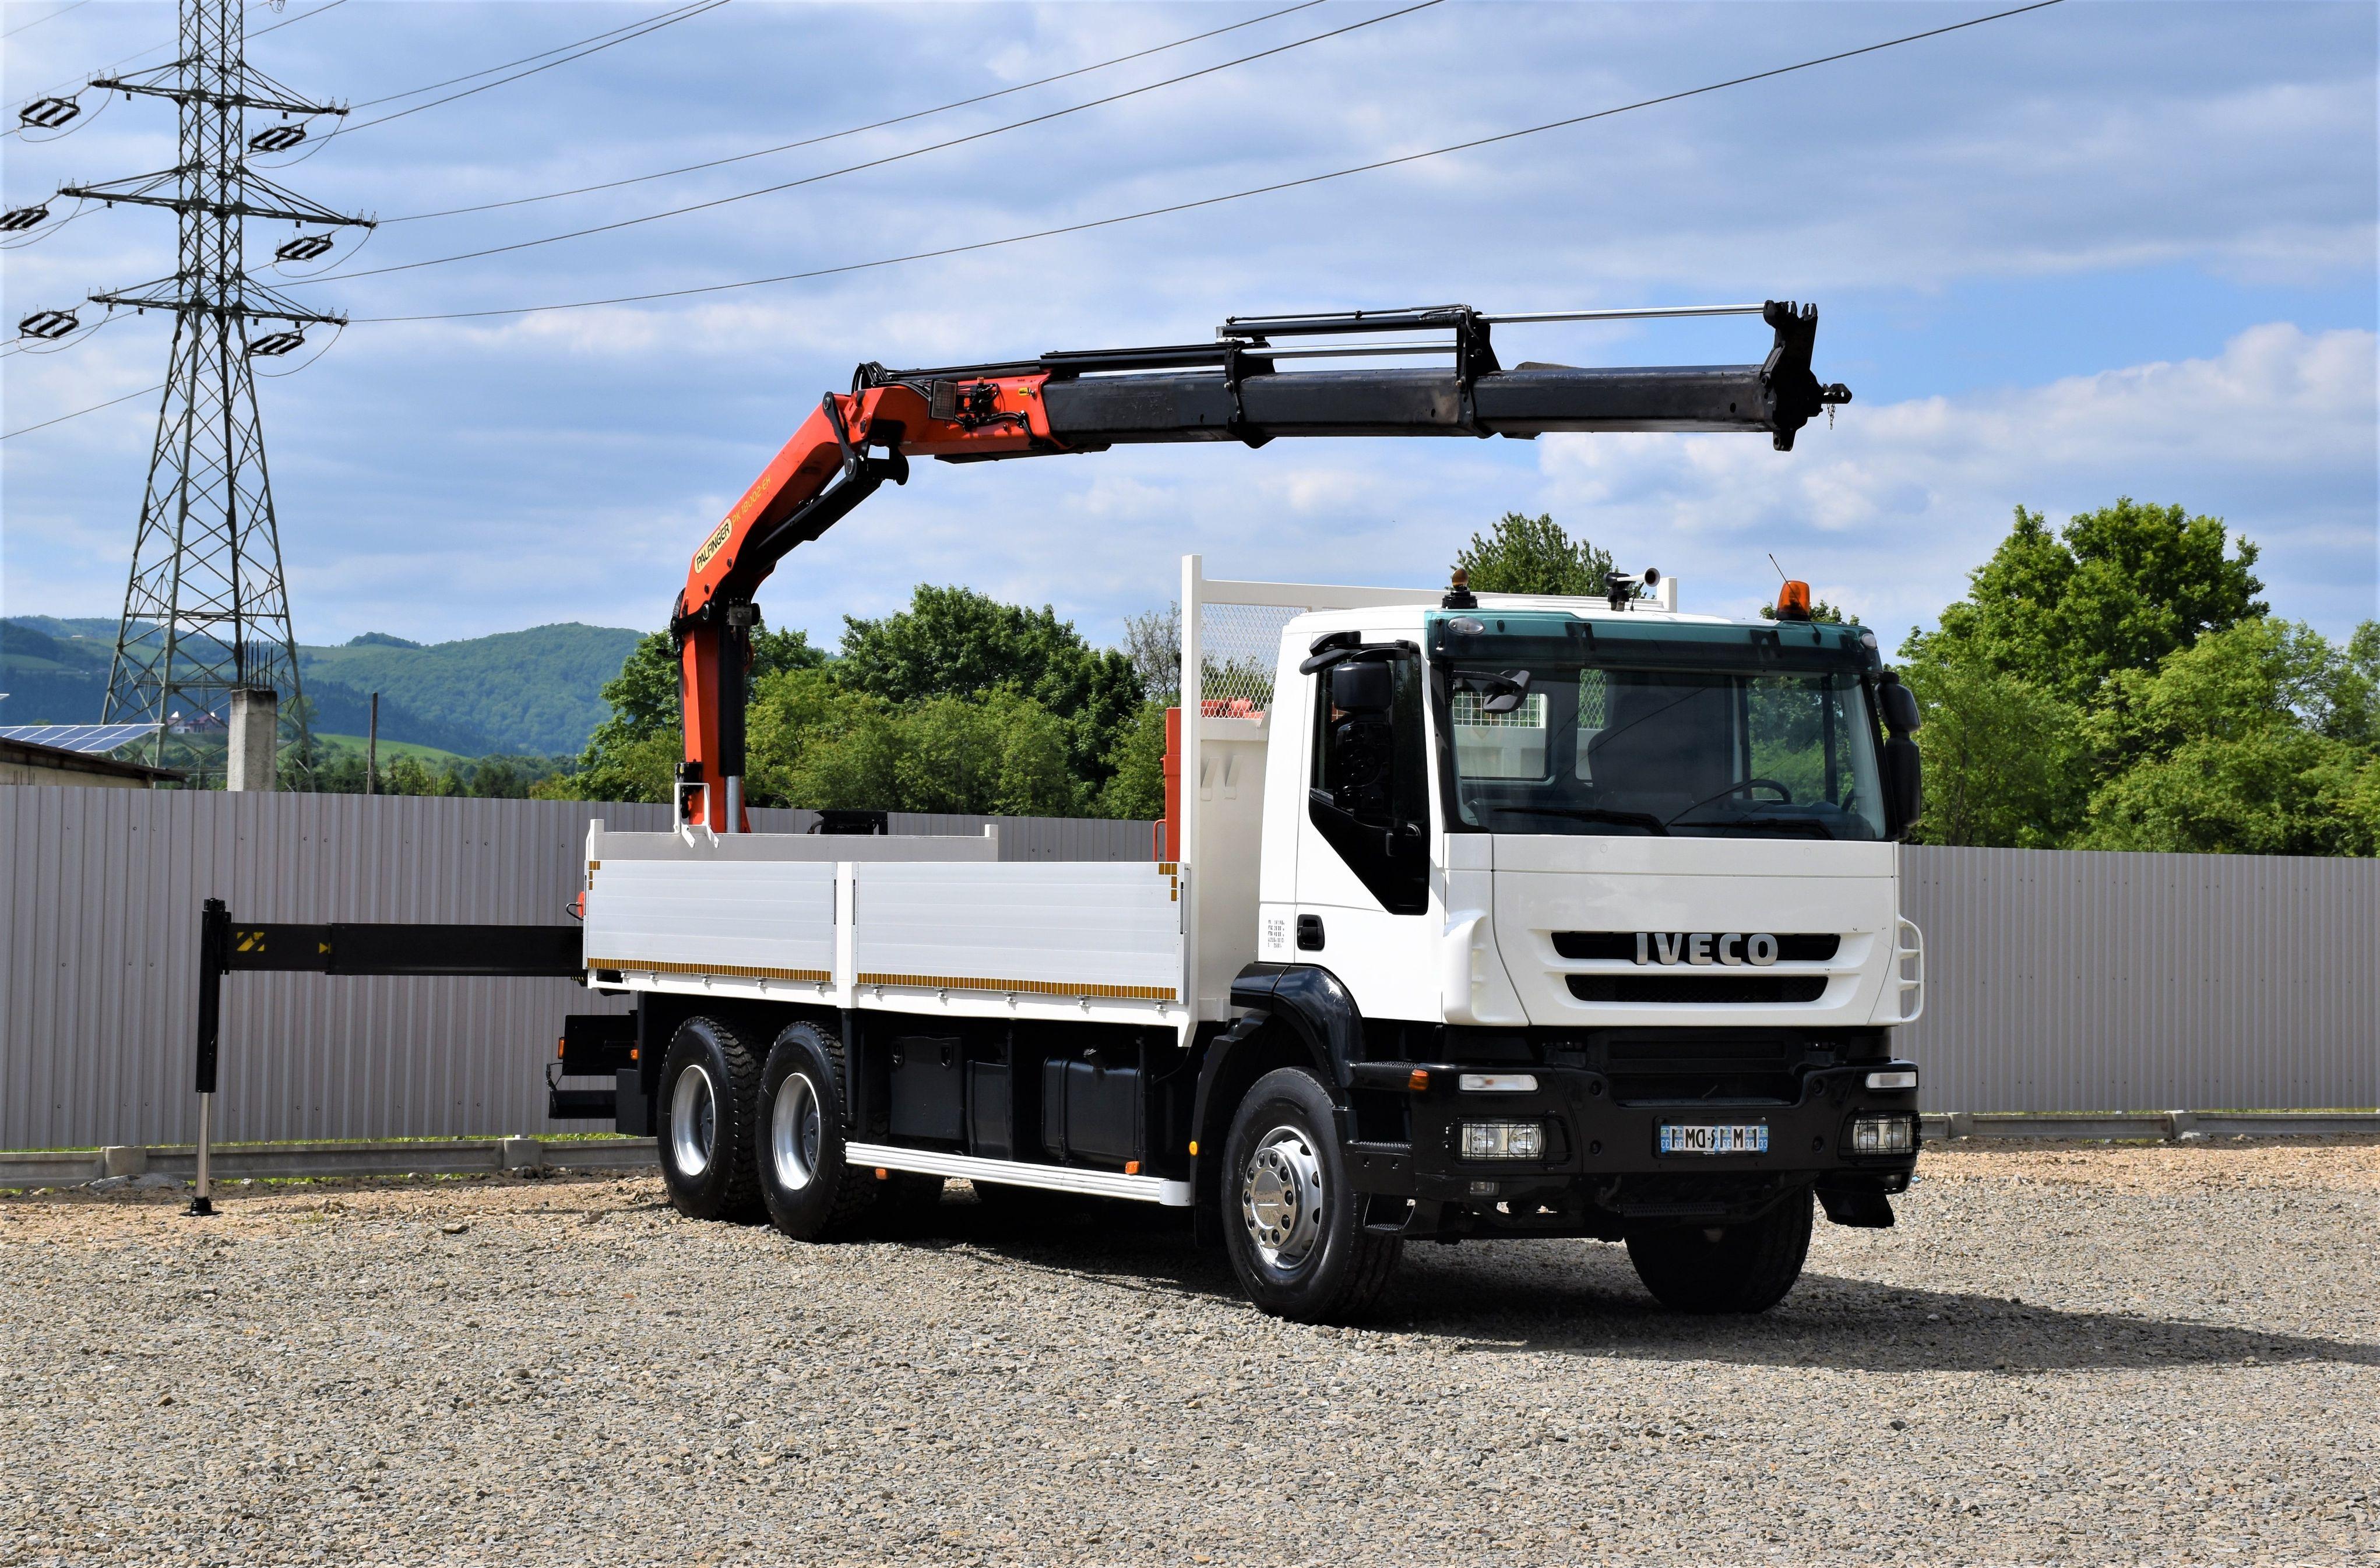 2012-iveco-trakker-360-388230-equipment-cover-image